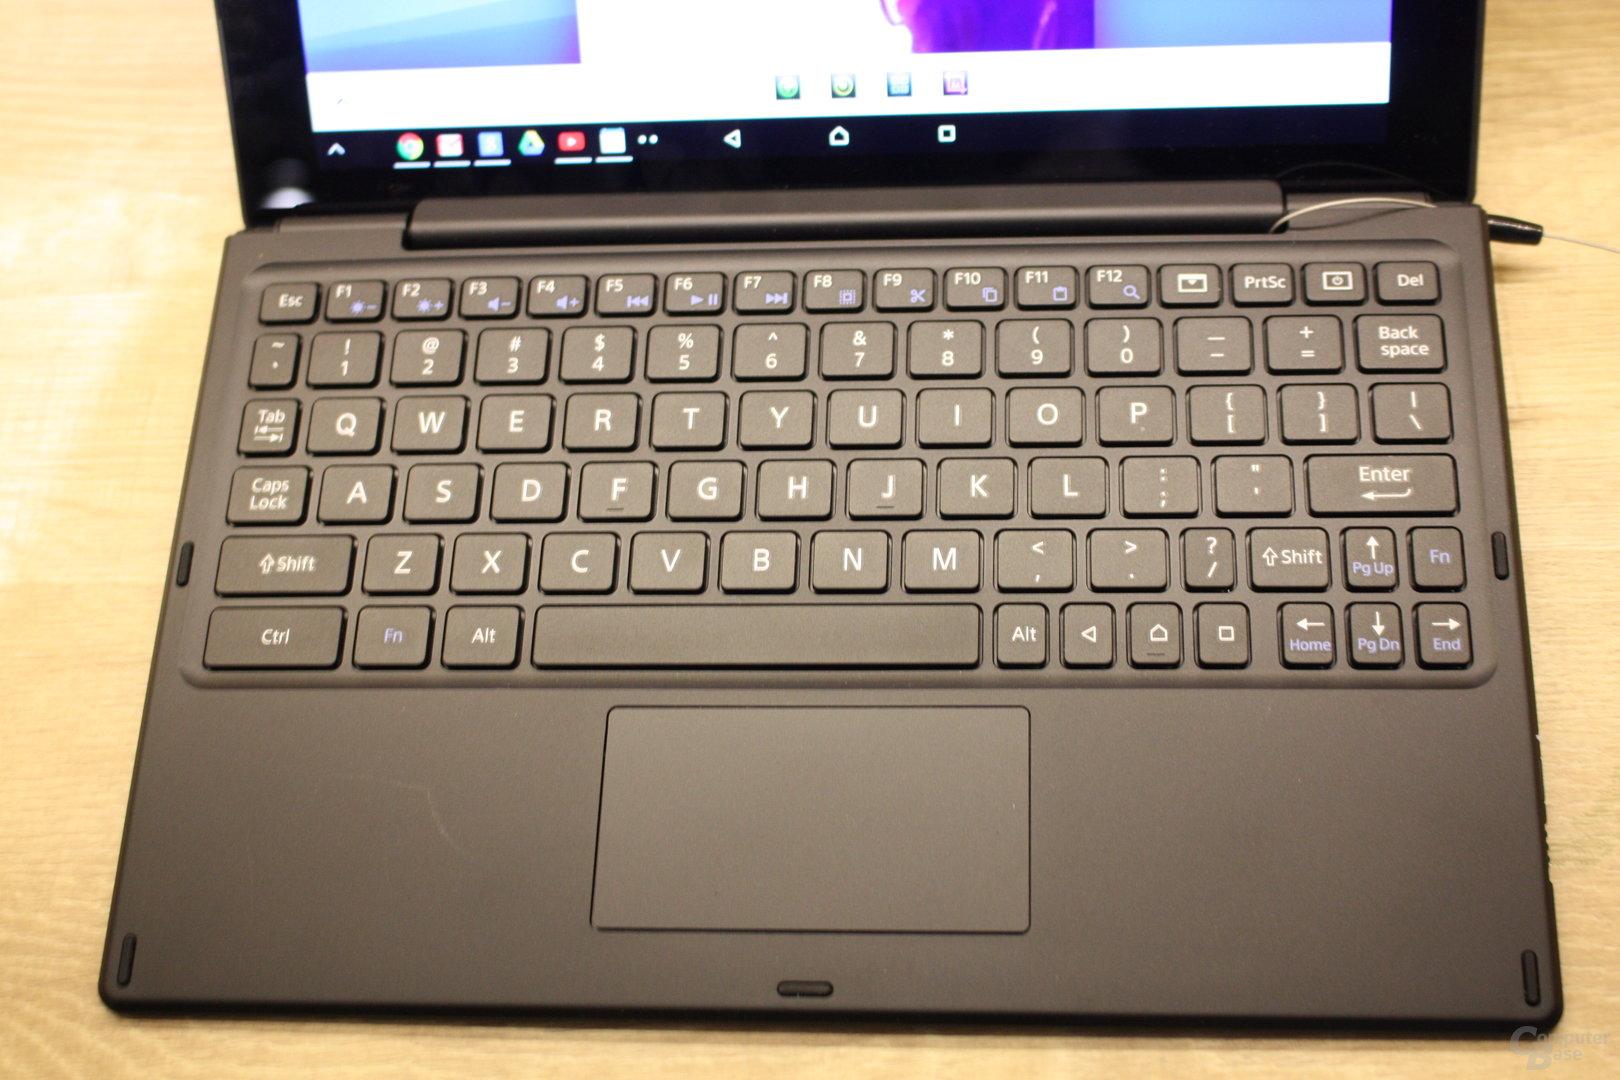 Sony Xperia Z4 Tablet mit Tastatur BKB50 ausprobiert